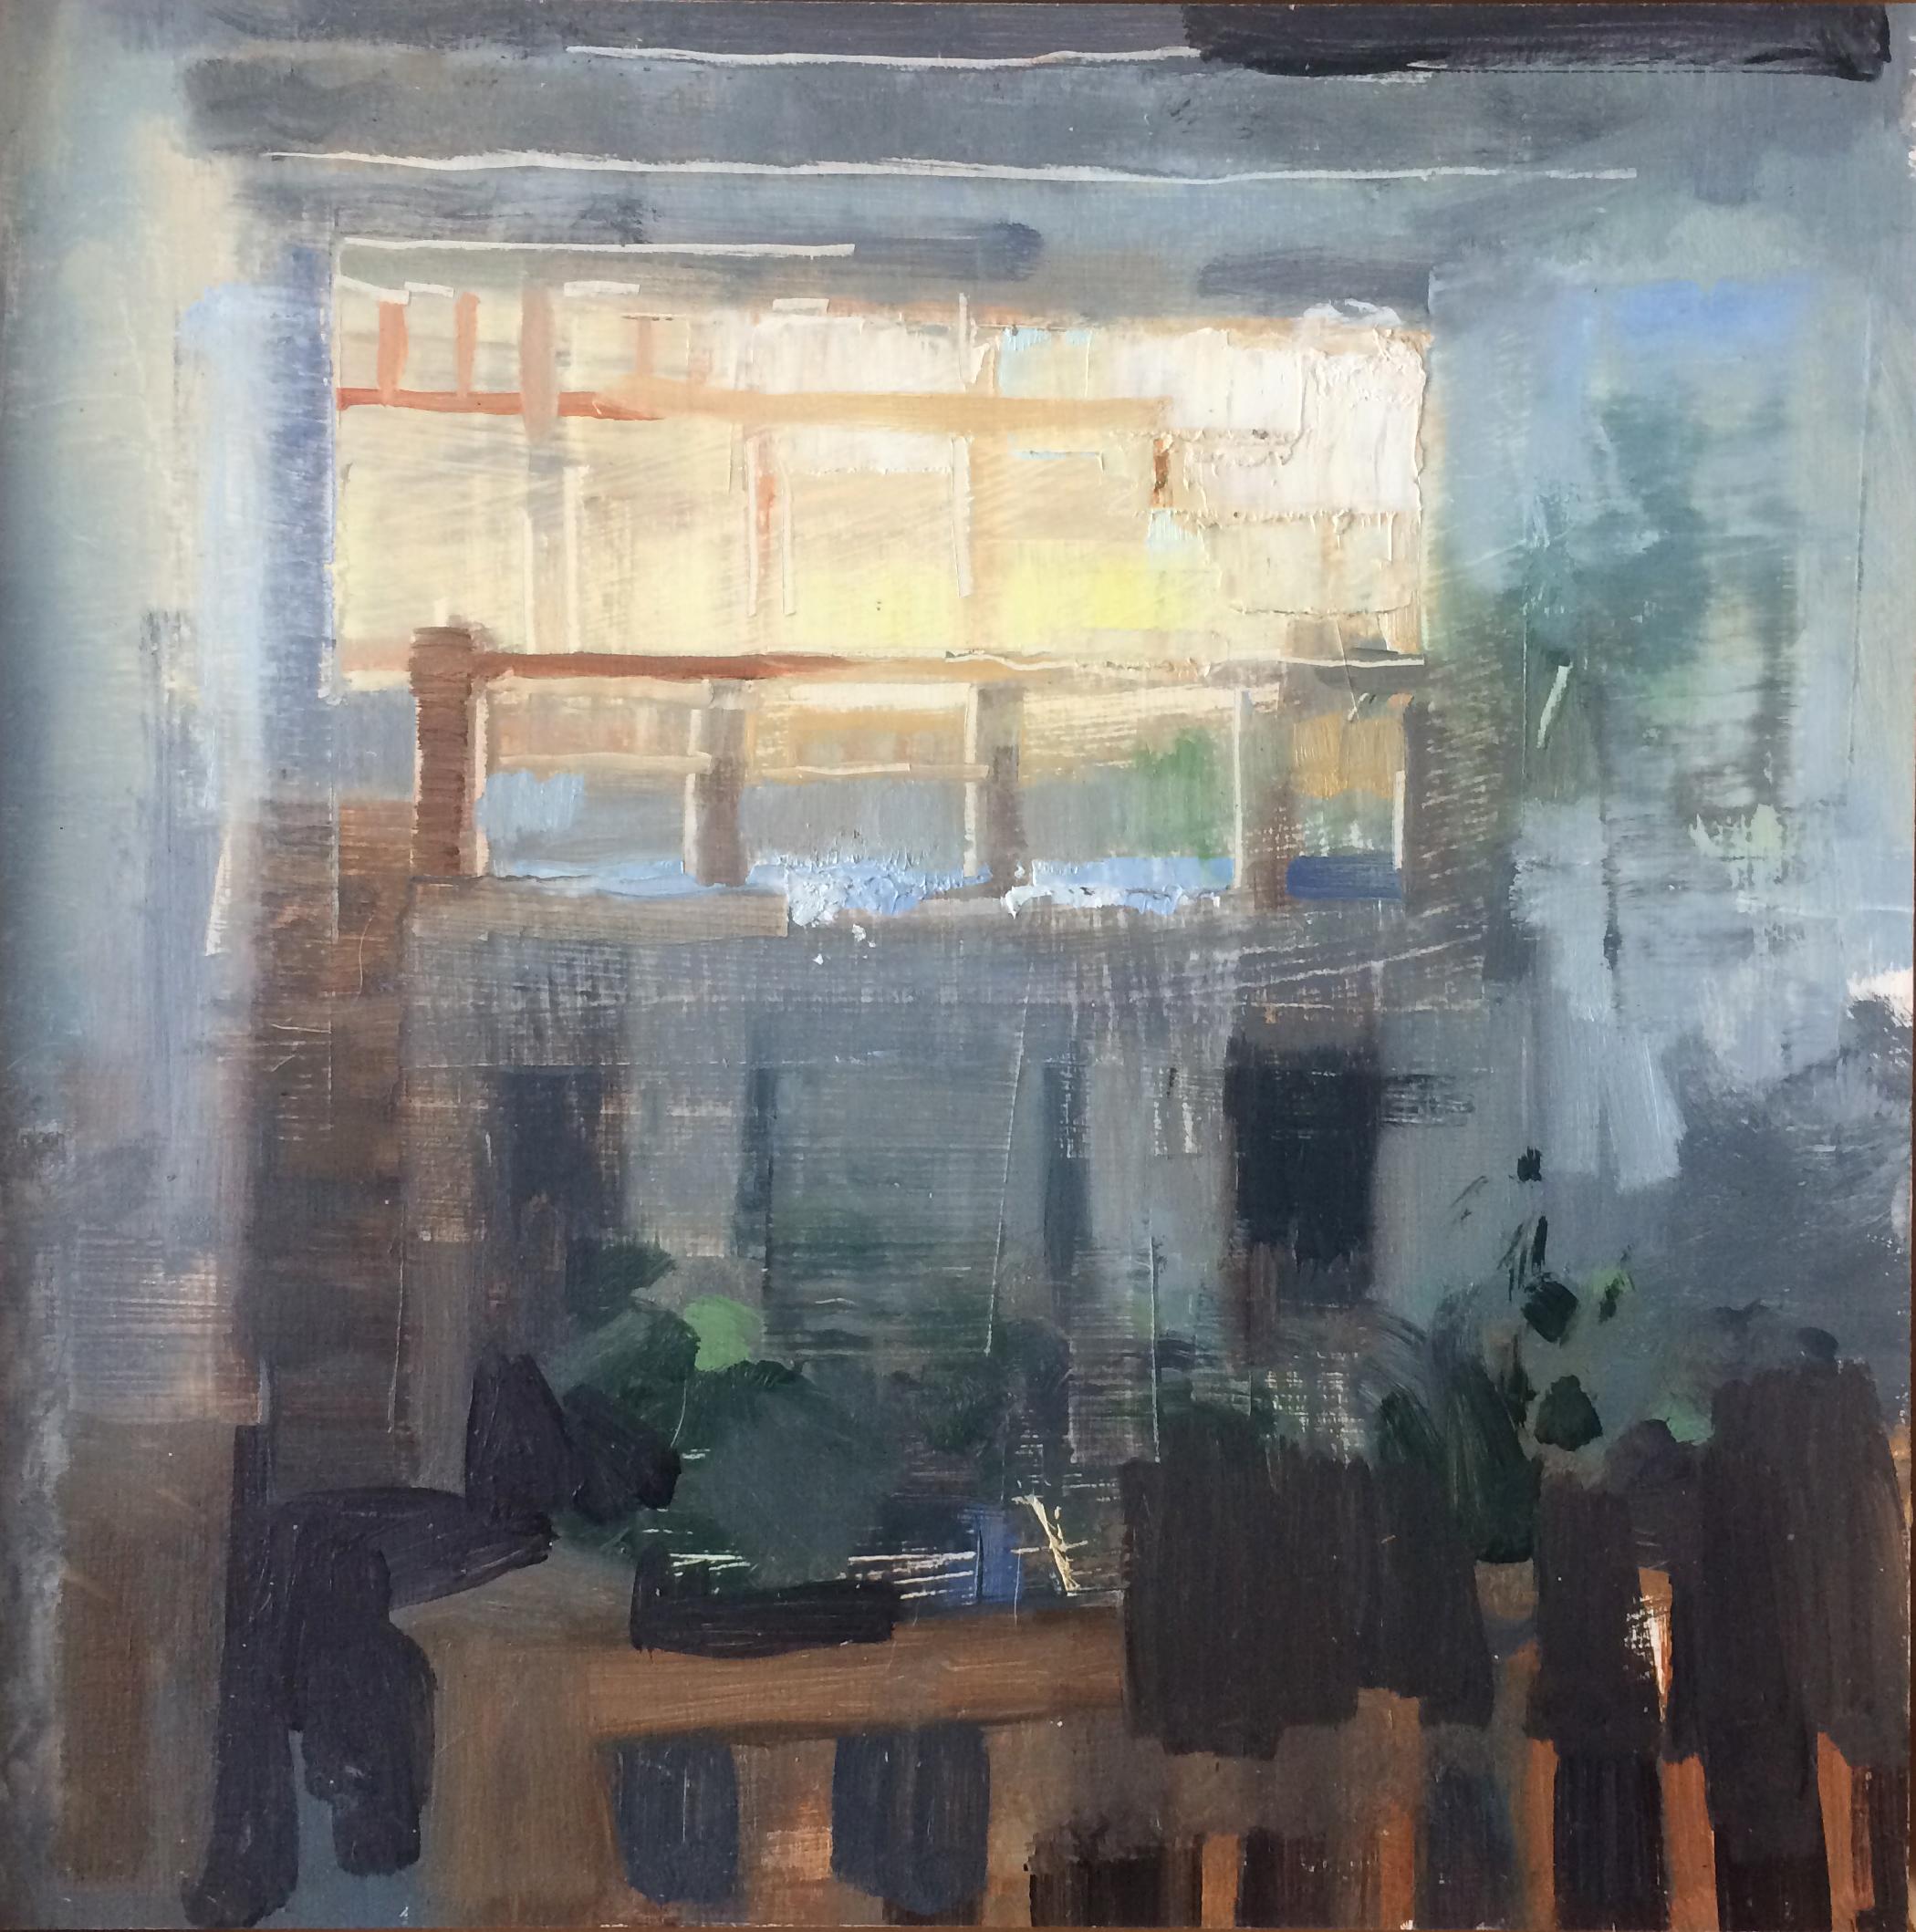 oakland studio 7.jpg